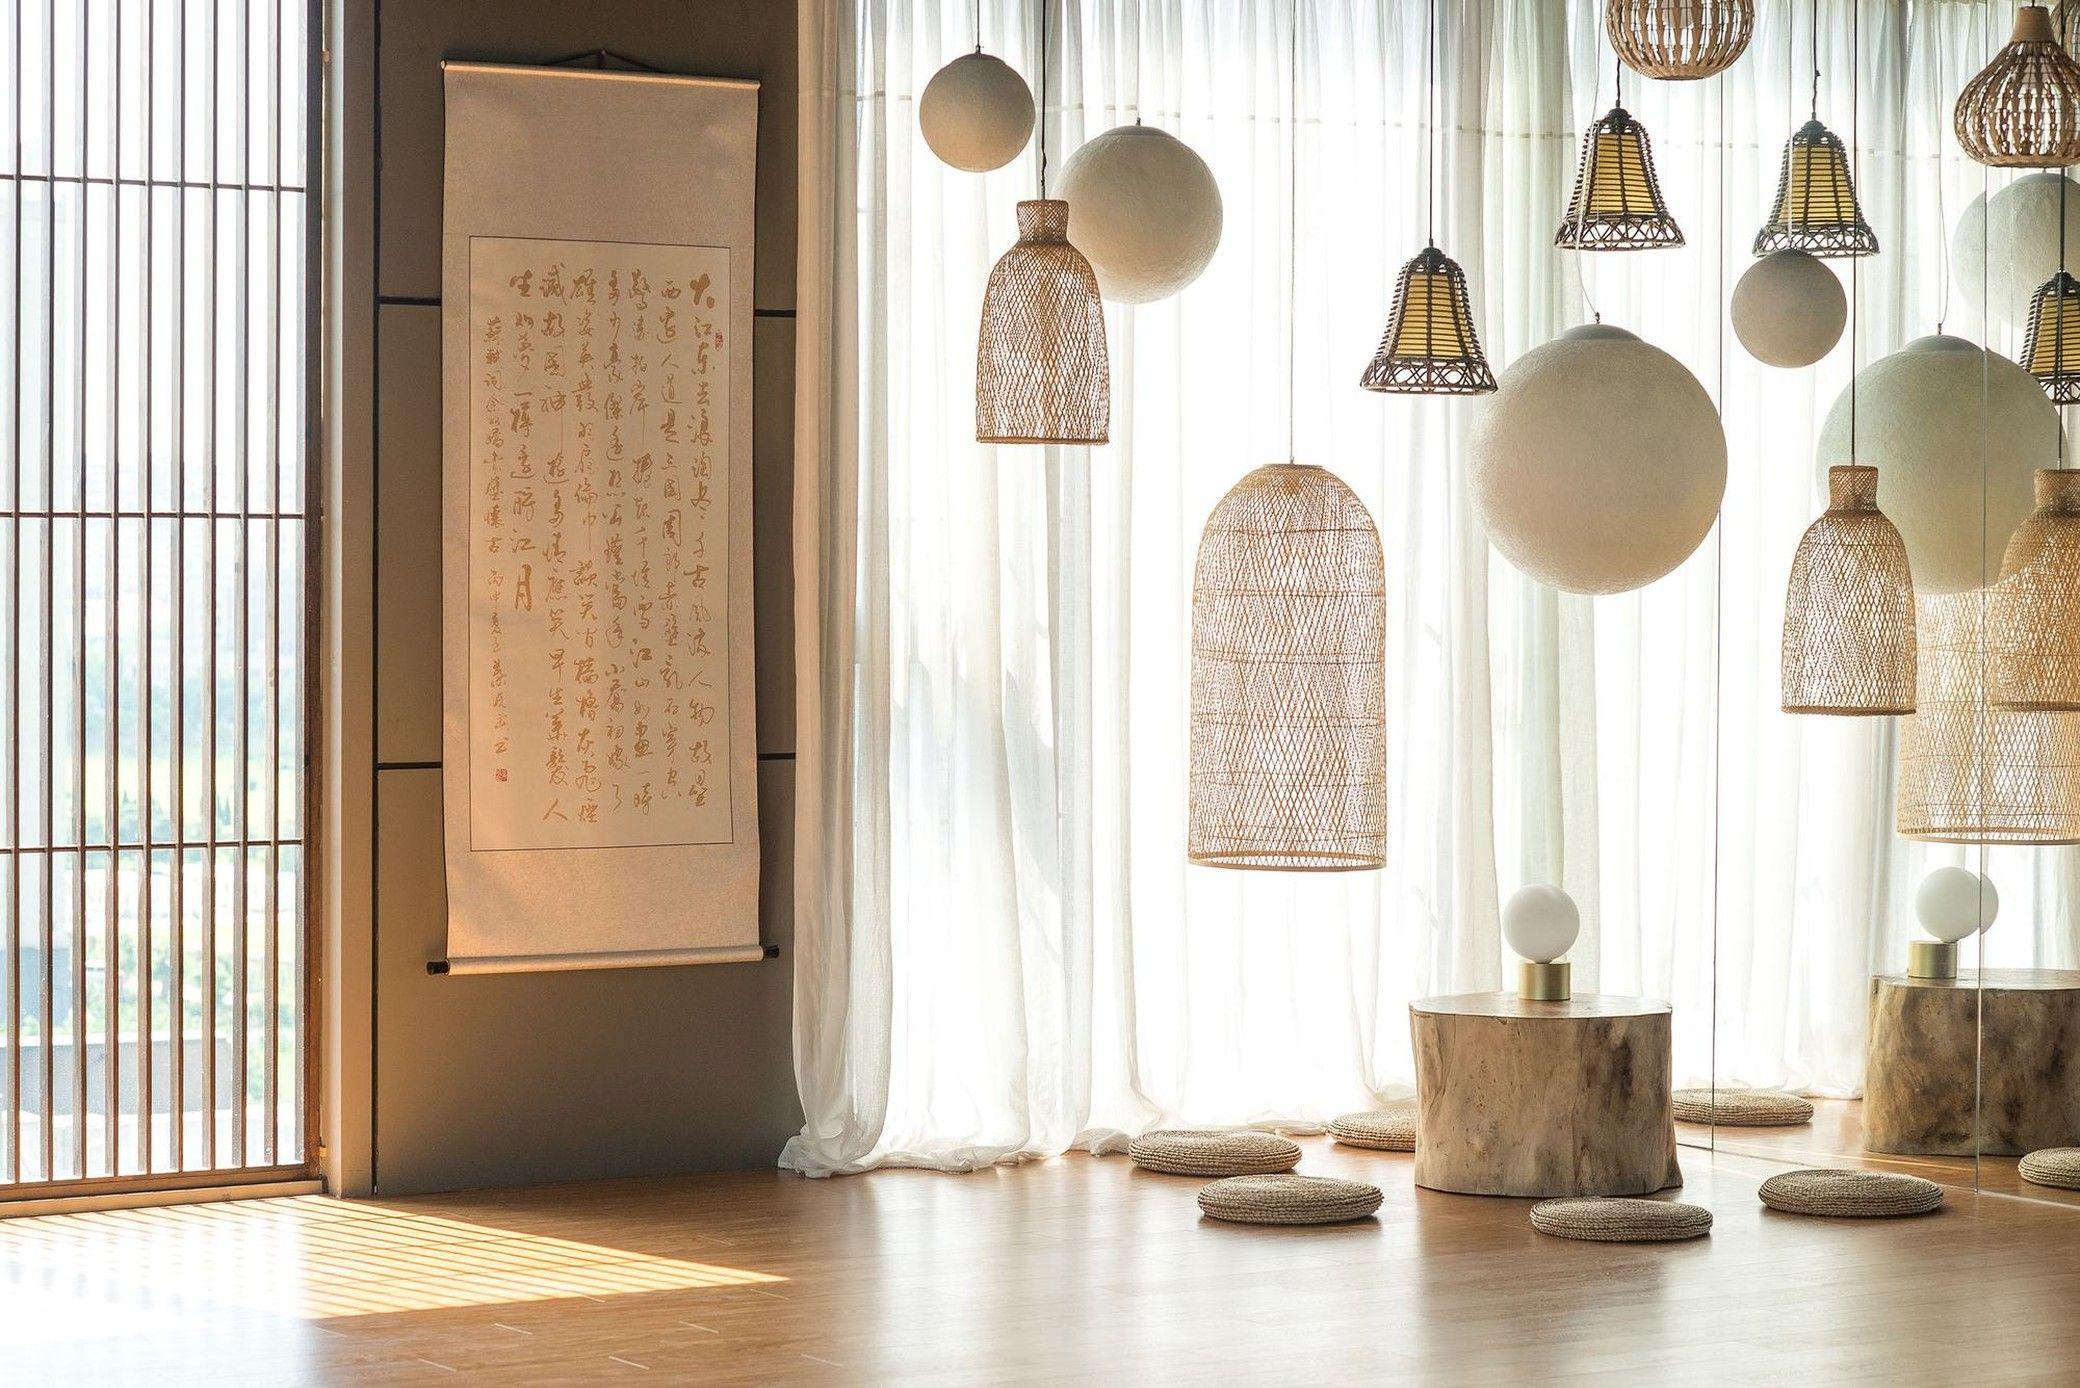 Yoga Studio | Kostas Chatzigiannis Architecture - Arch2O.com